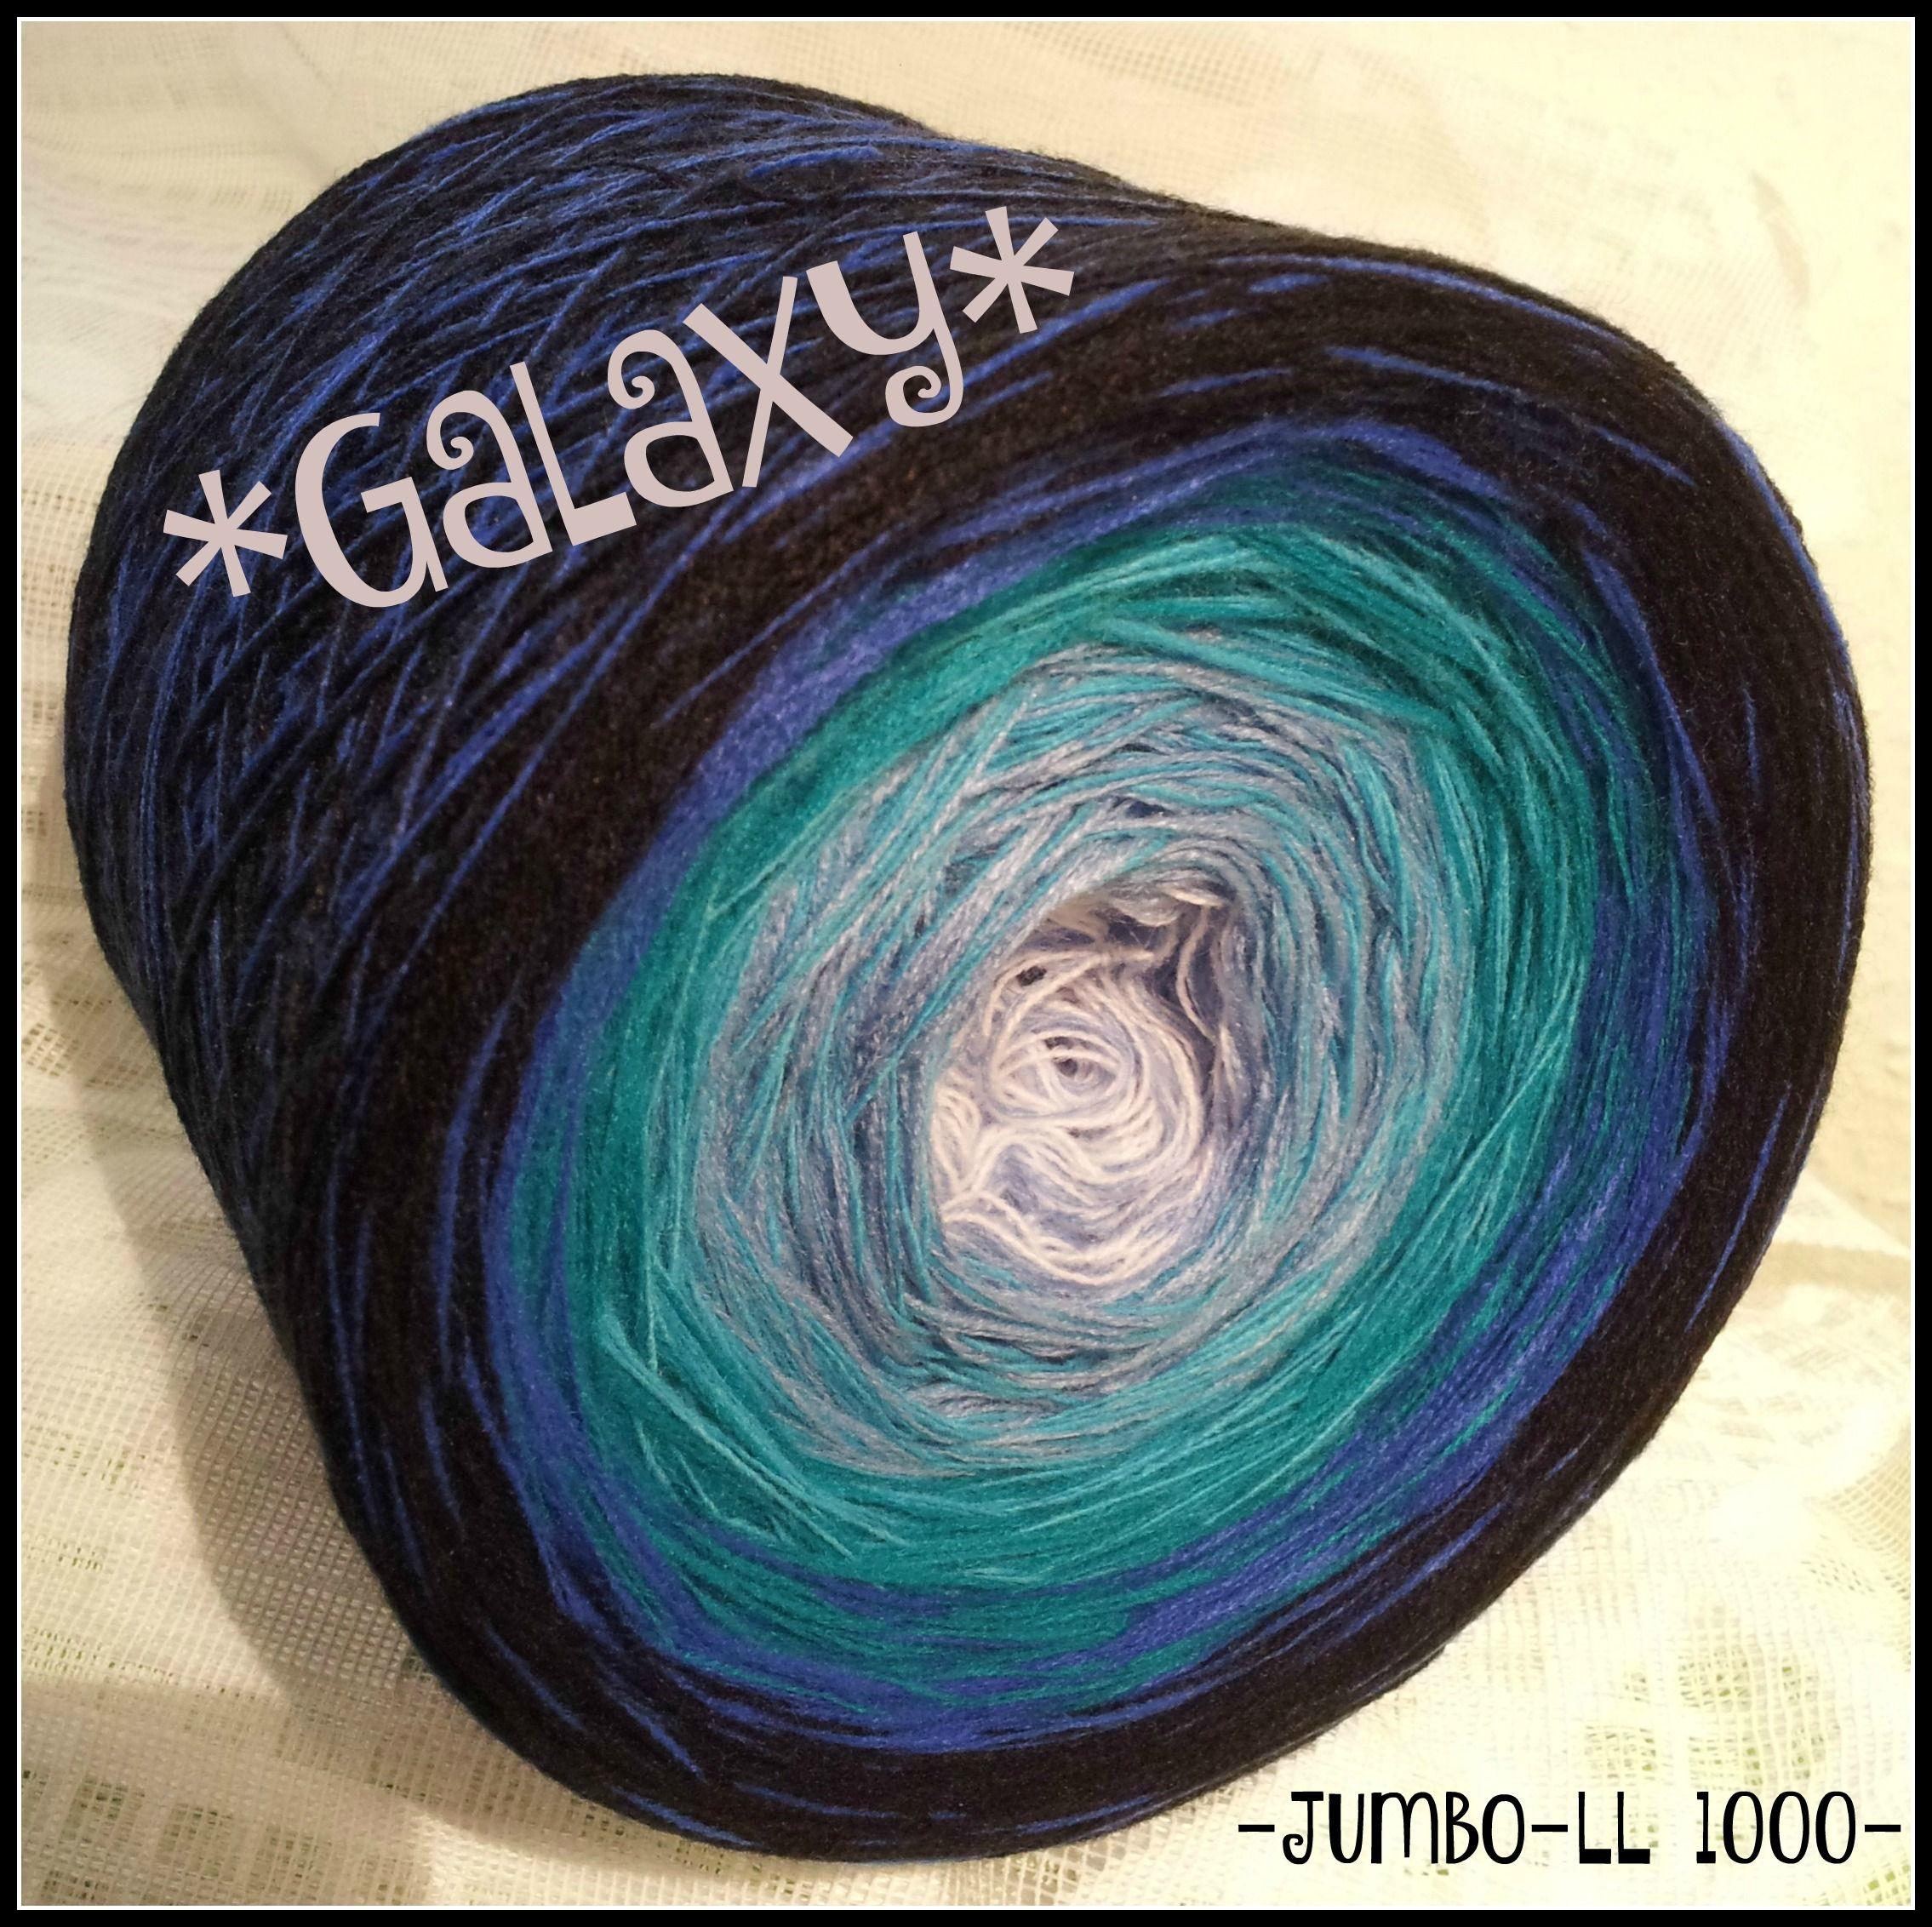 Petrol Blau Wandfarbe: Galaxy Jumbo 1000 LL Hochbauschacryl 3 Fäden, 6 Farben